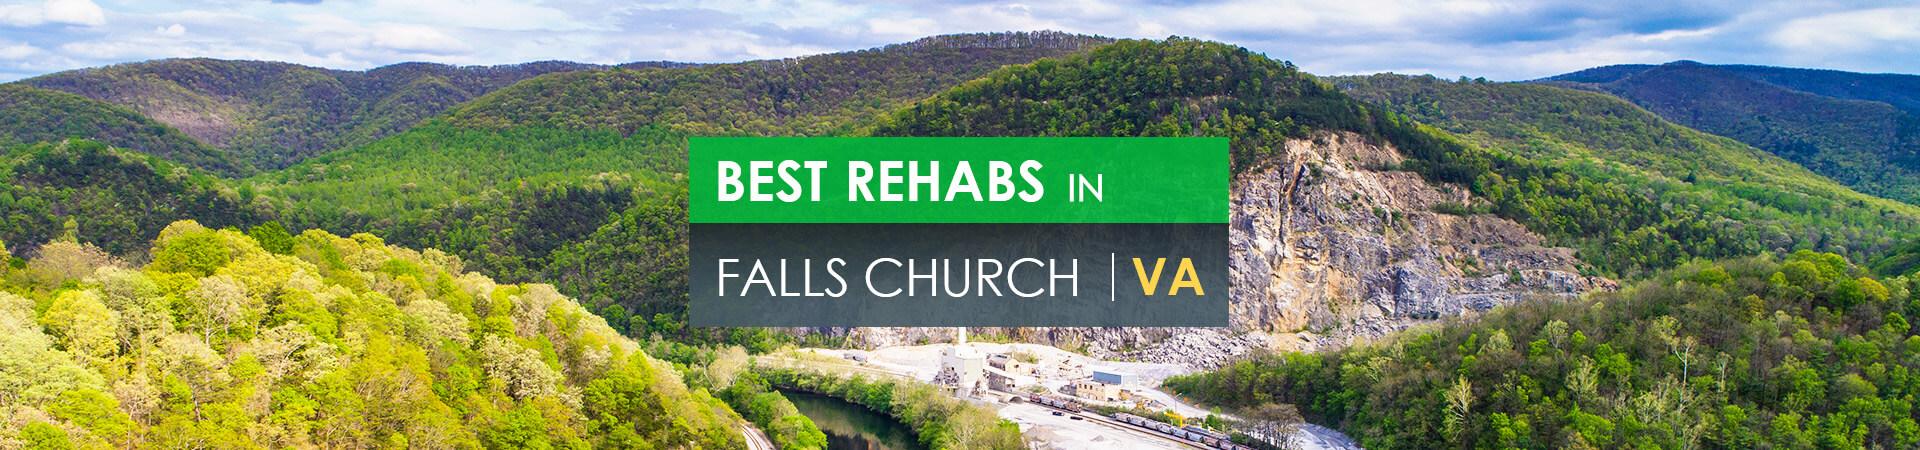 Best rehabs in Falls Church, VA